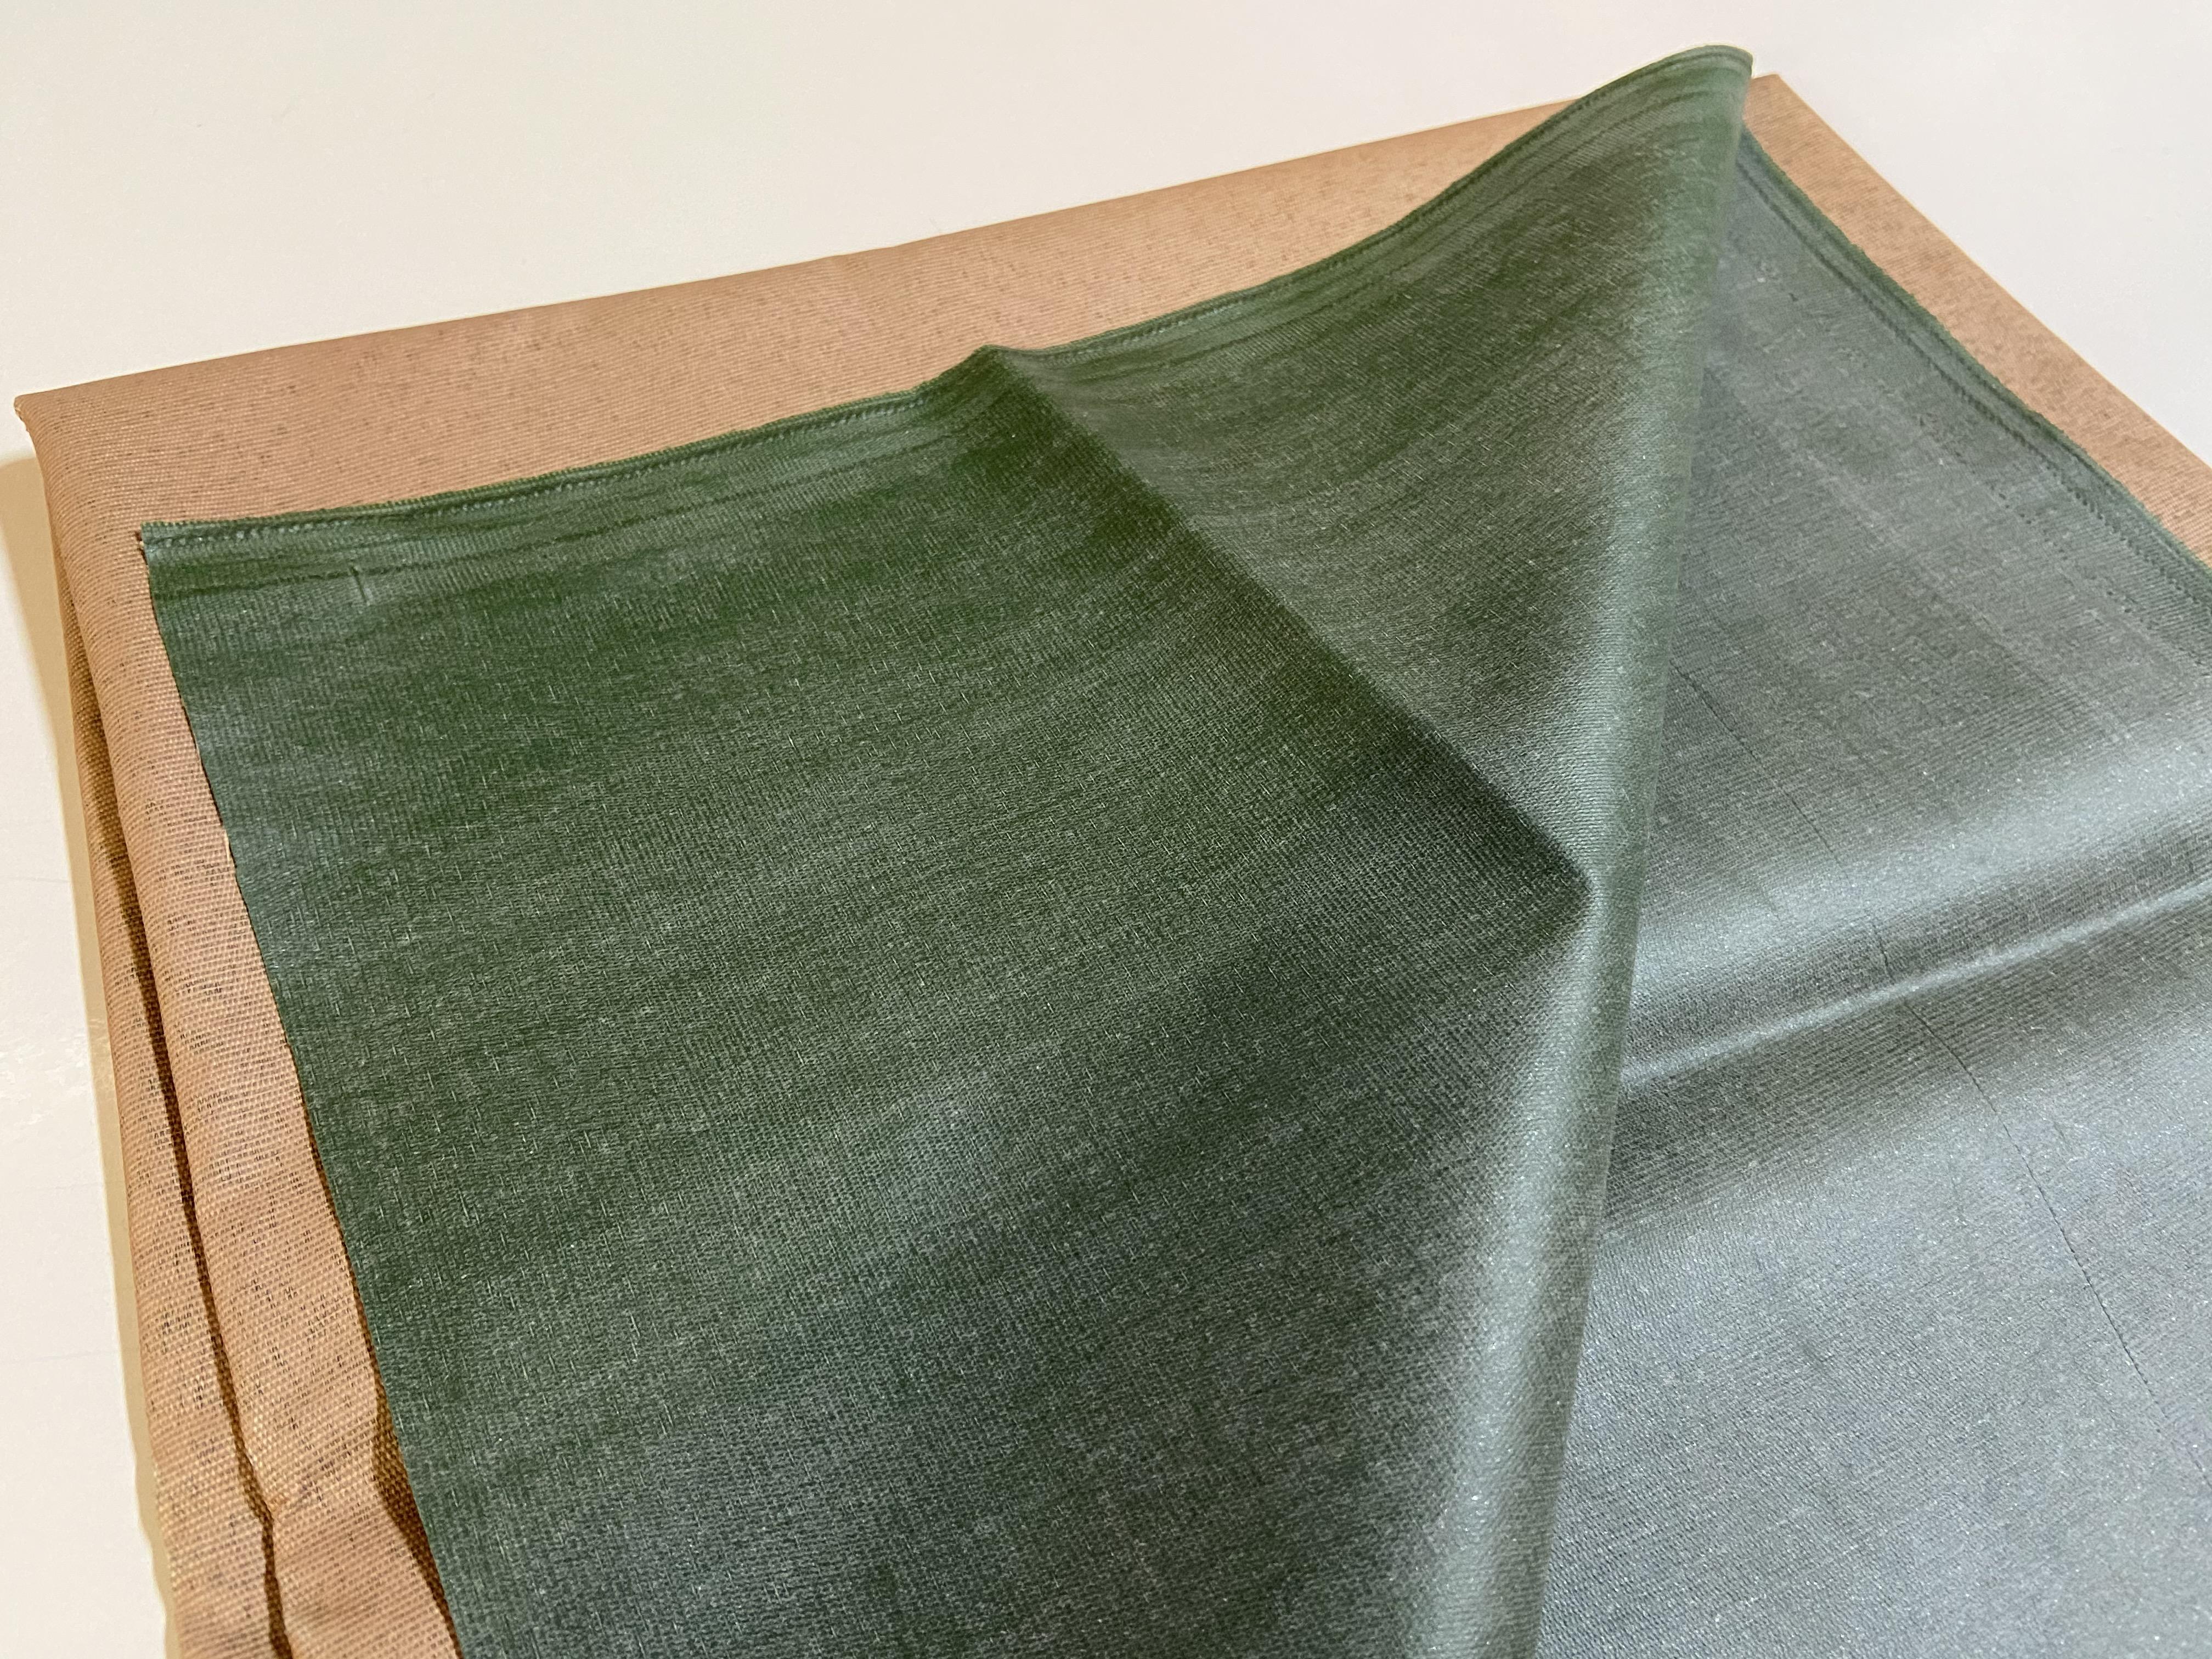 Rubberized Fabric, 130cm